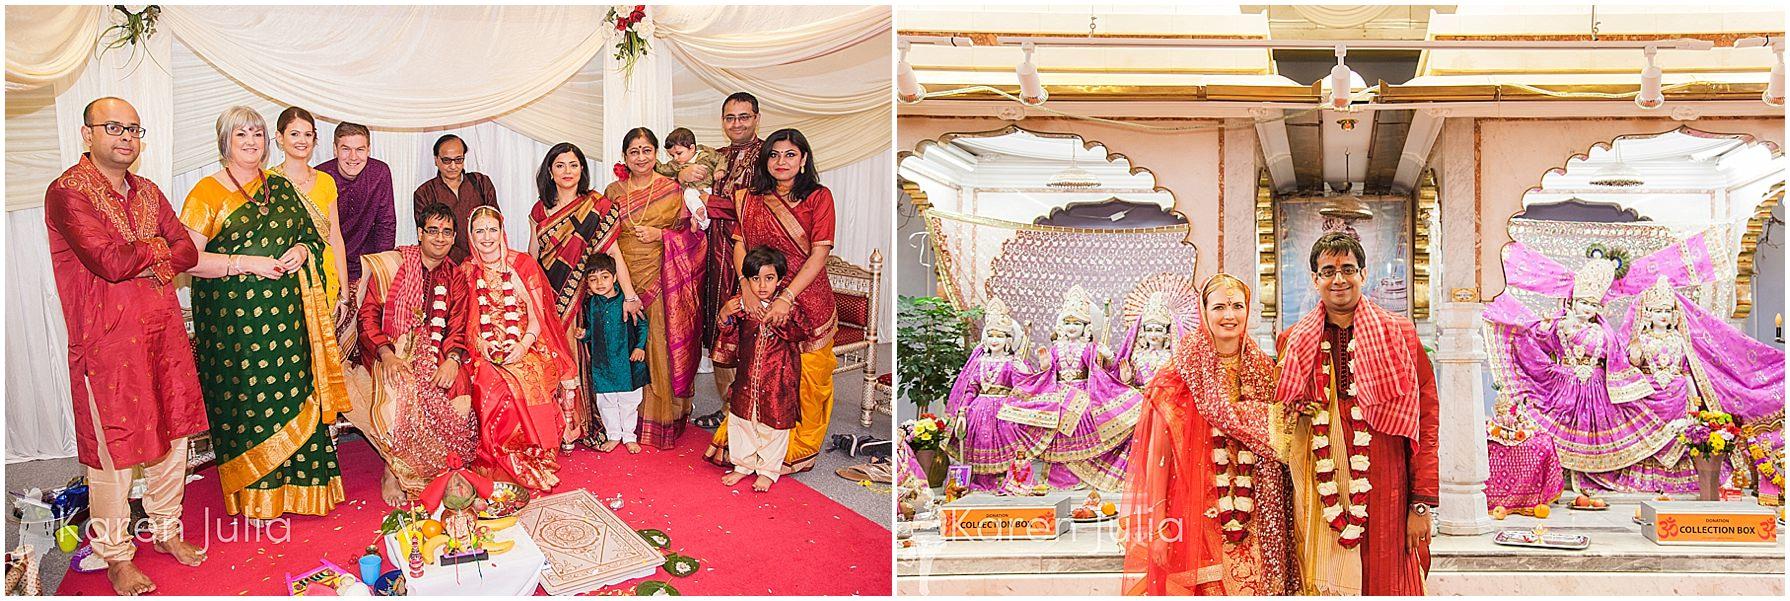 Gita-Bhavan-Hindu-Temple-Wedding-Photography-10